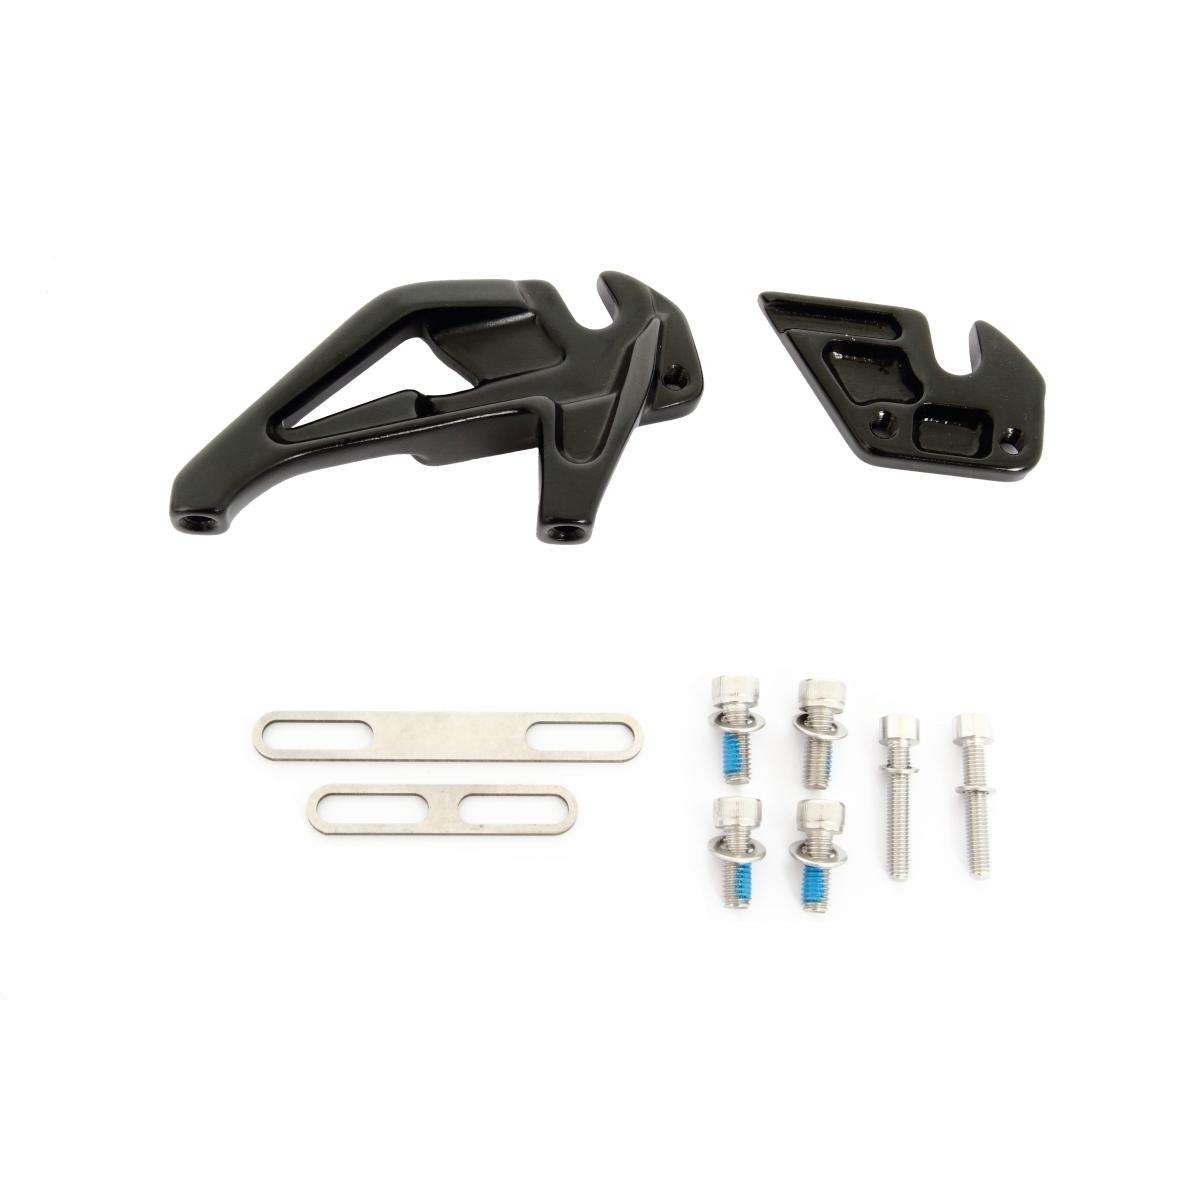 Geardrop Cannondale CK3327U00OS | Derailleur hanger